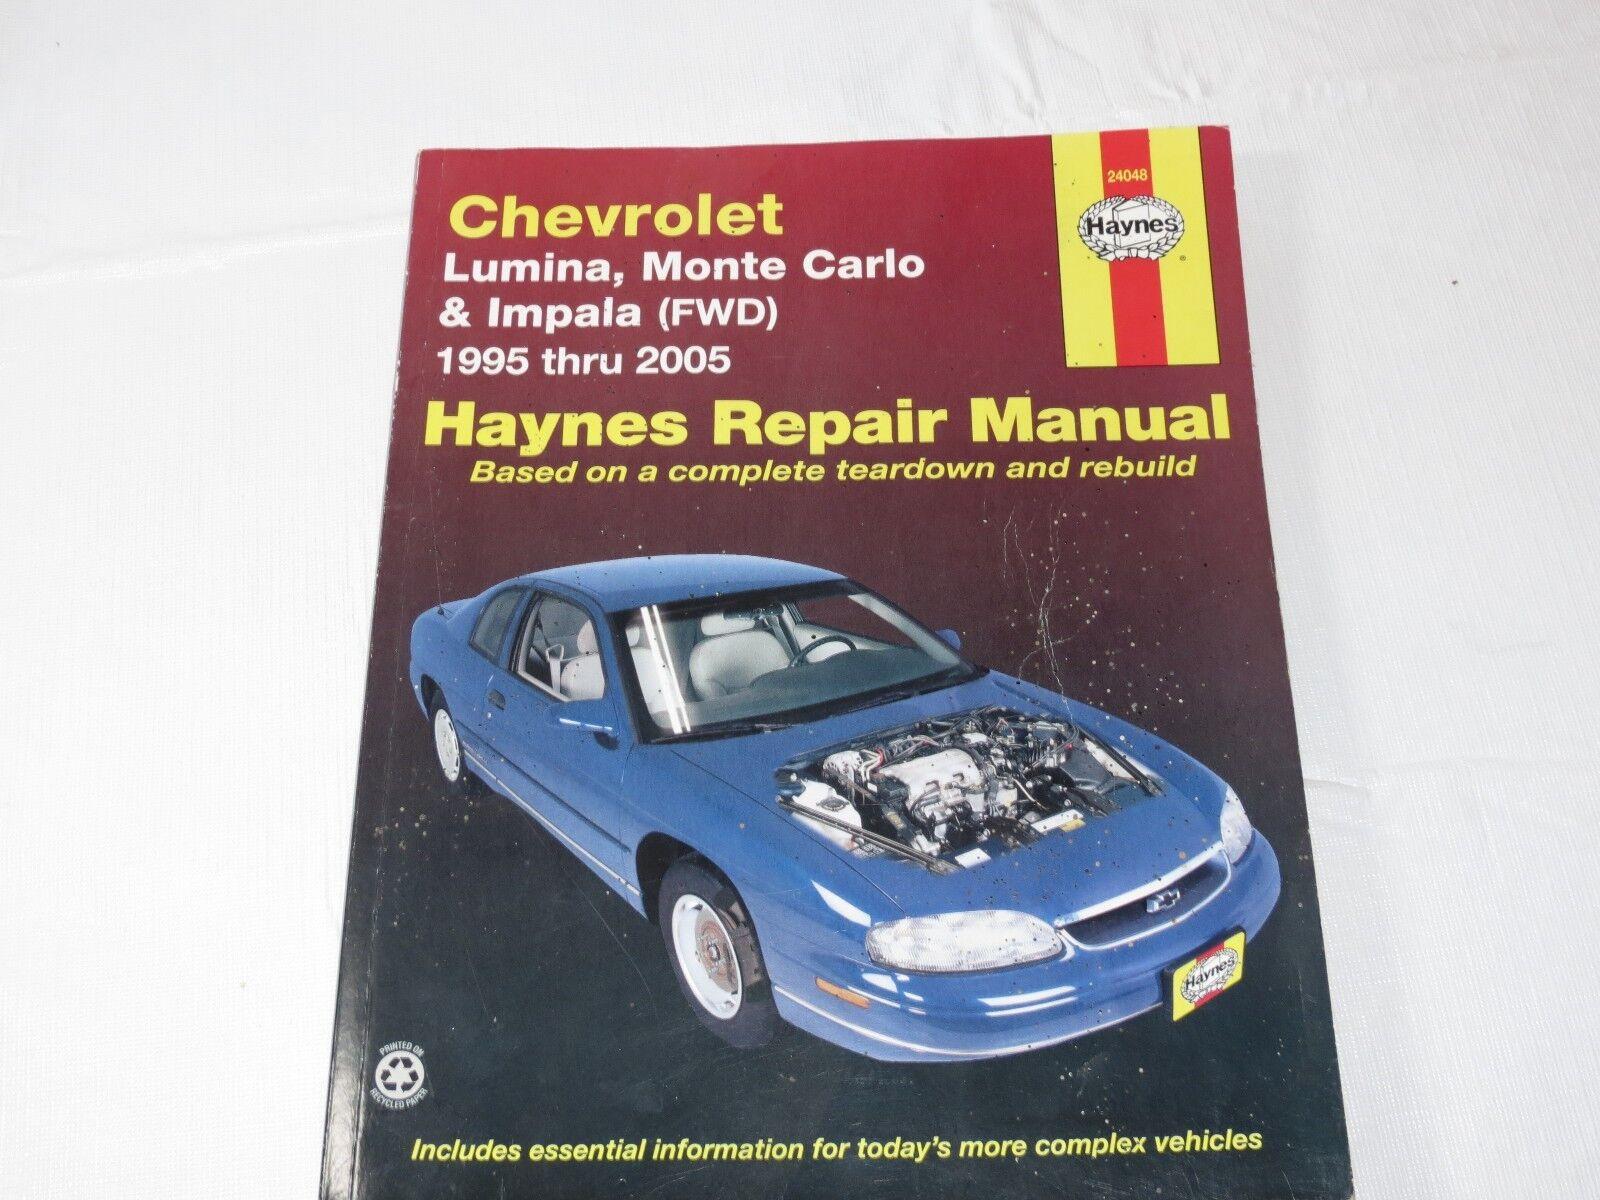 Monte Carlo Impala FWD Repair Manual 1995-2005 Chevy Lumina